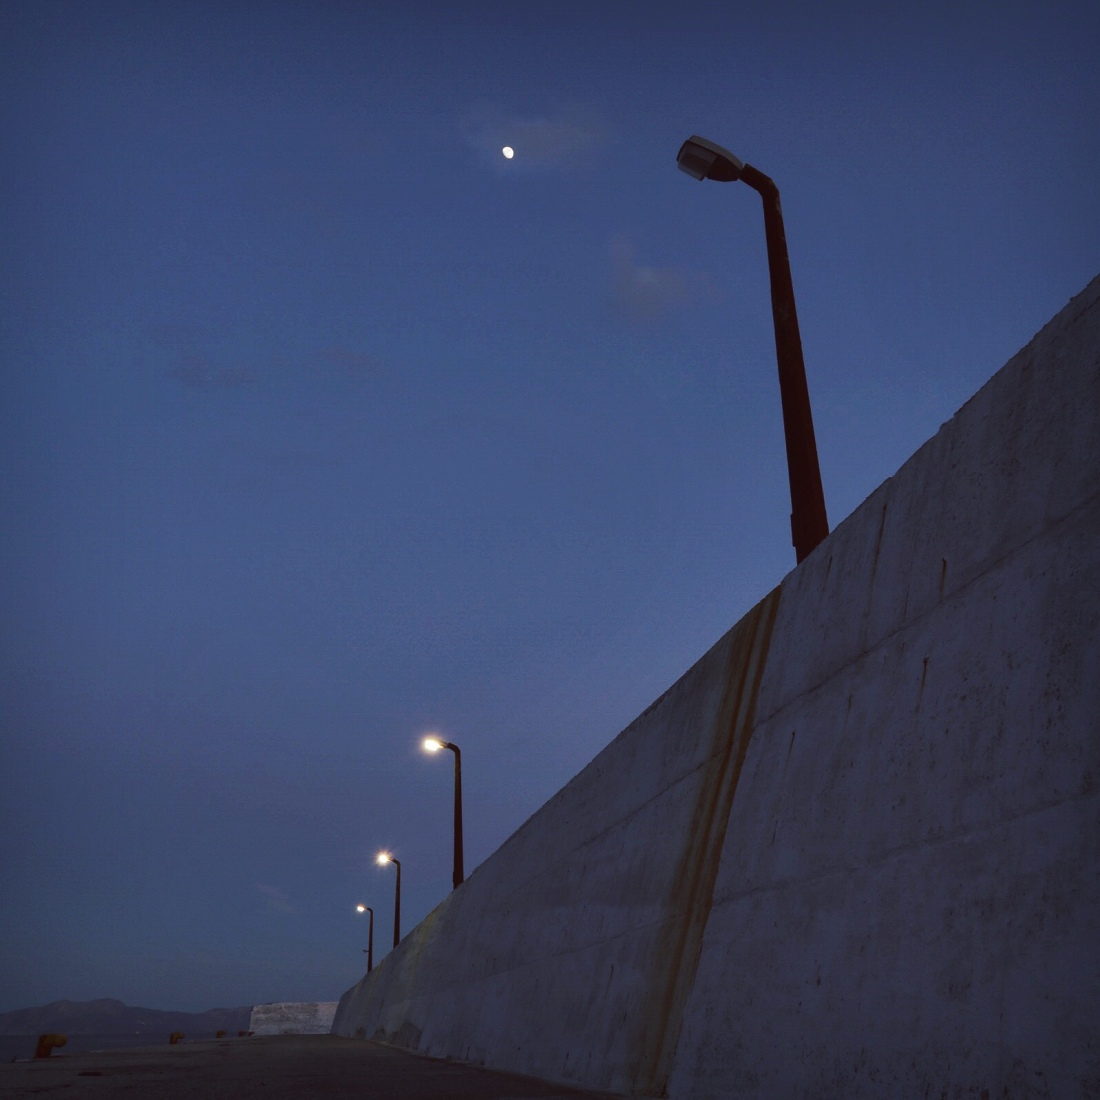 Haïku de lune et de lampadaire au port d'Ikaria